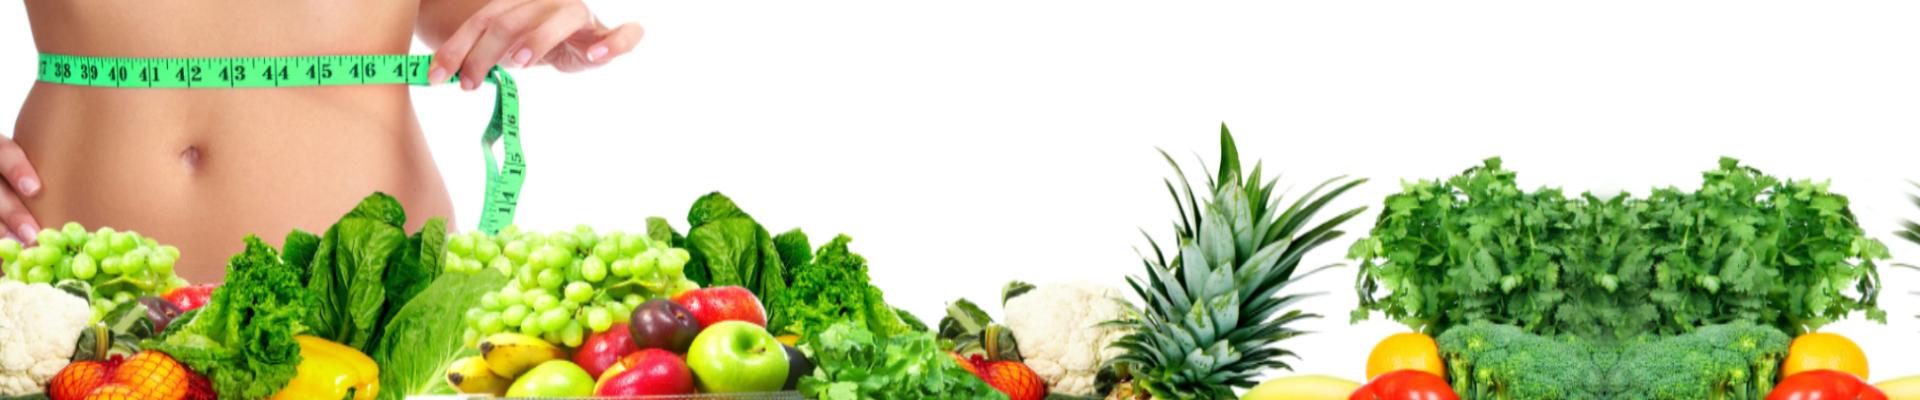 nutrizione_homepage